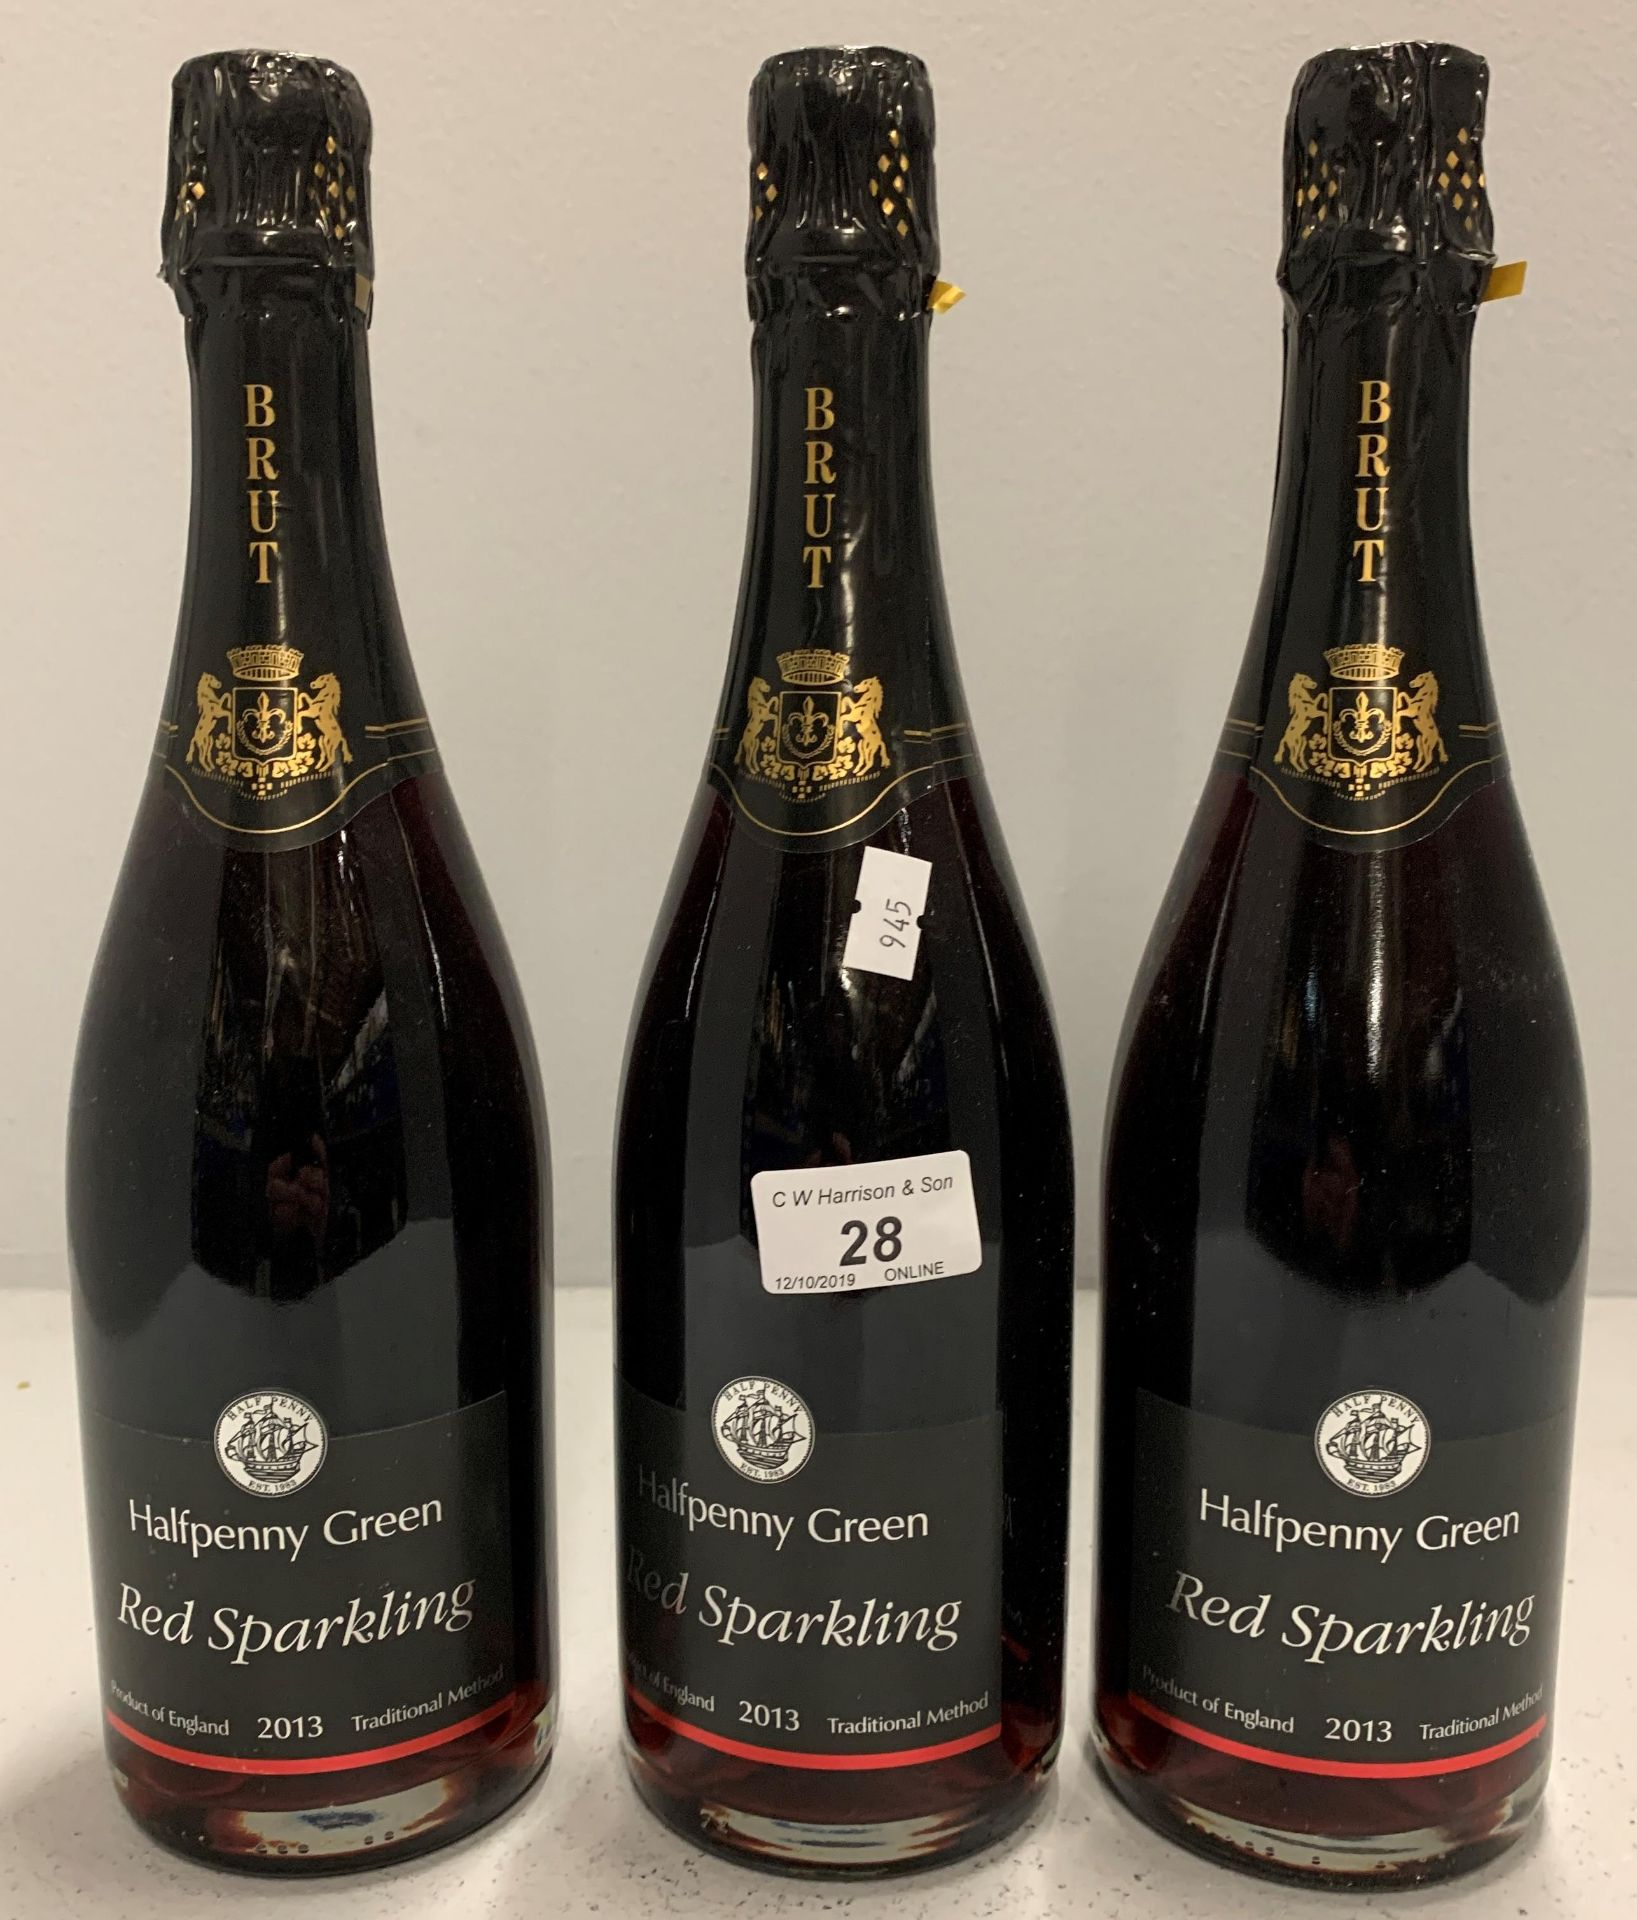 Lot 28 - 3 x 75cl bottles Half Penny Green Red Sp